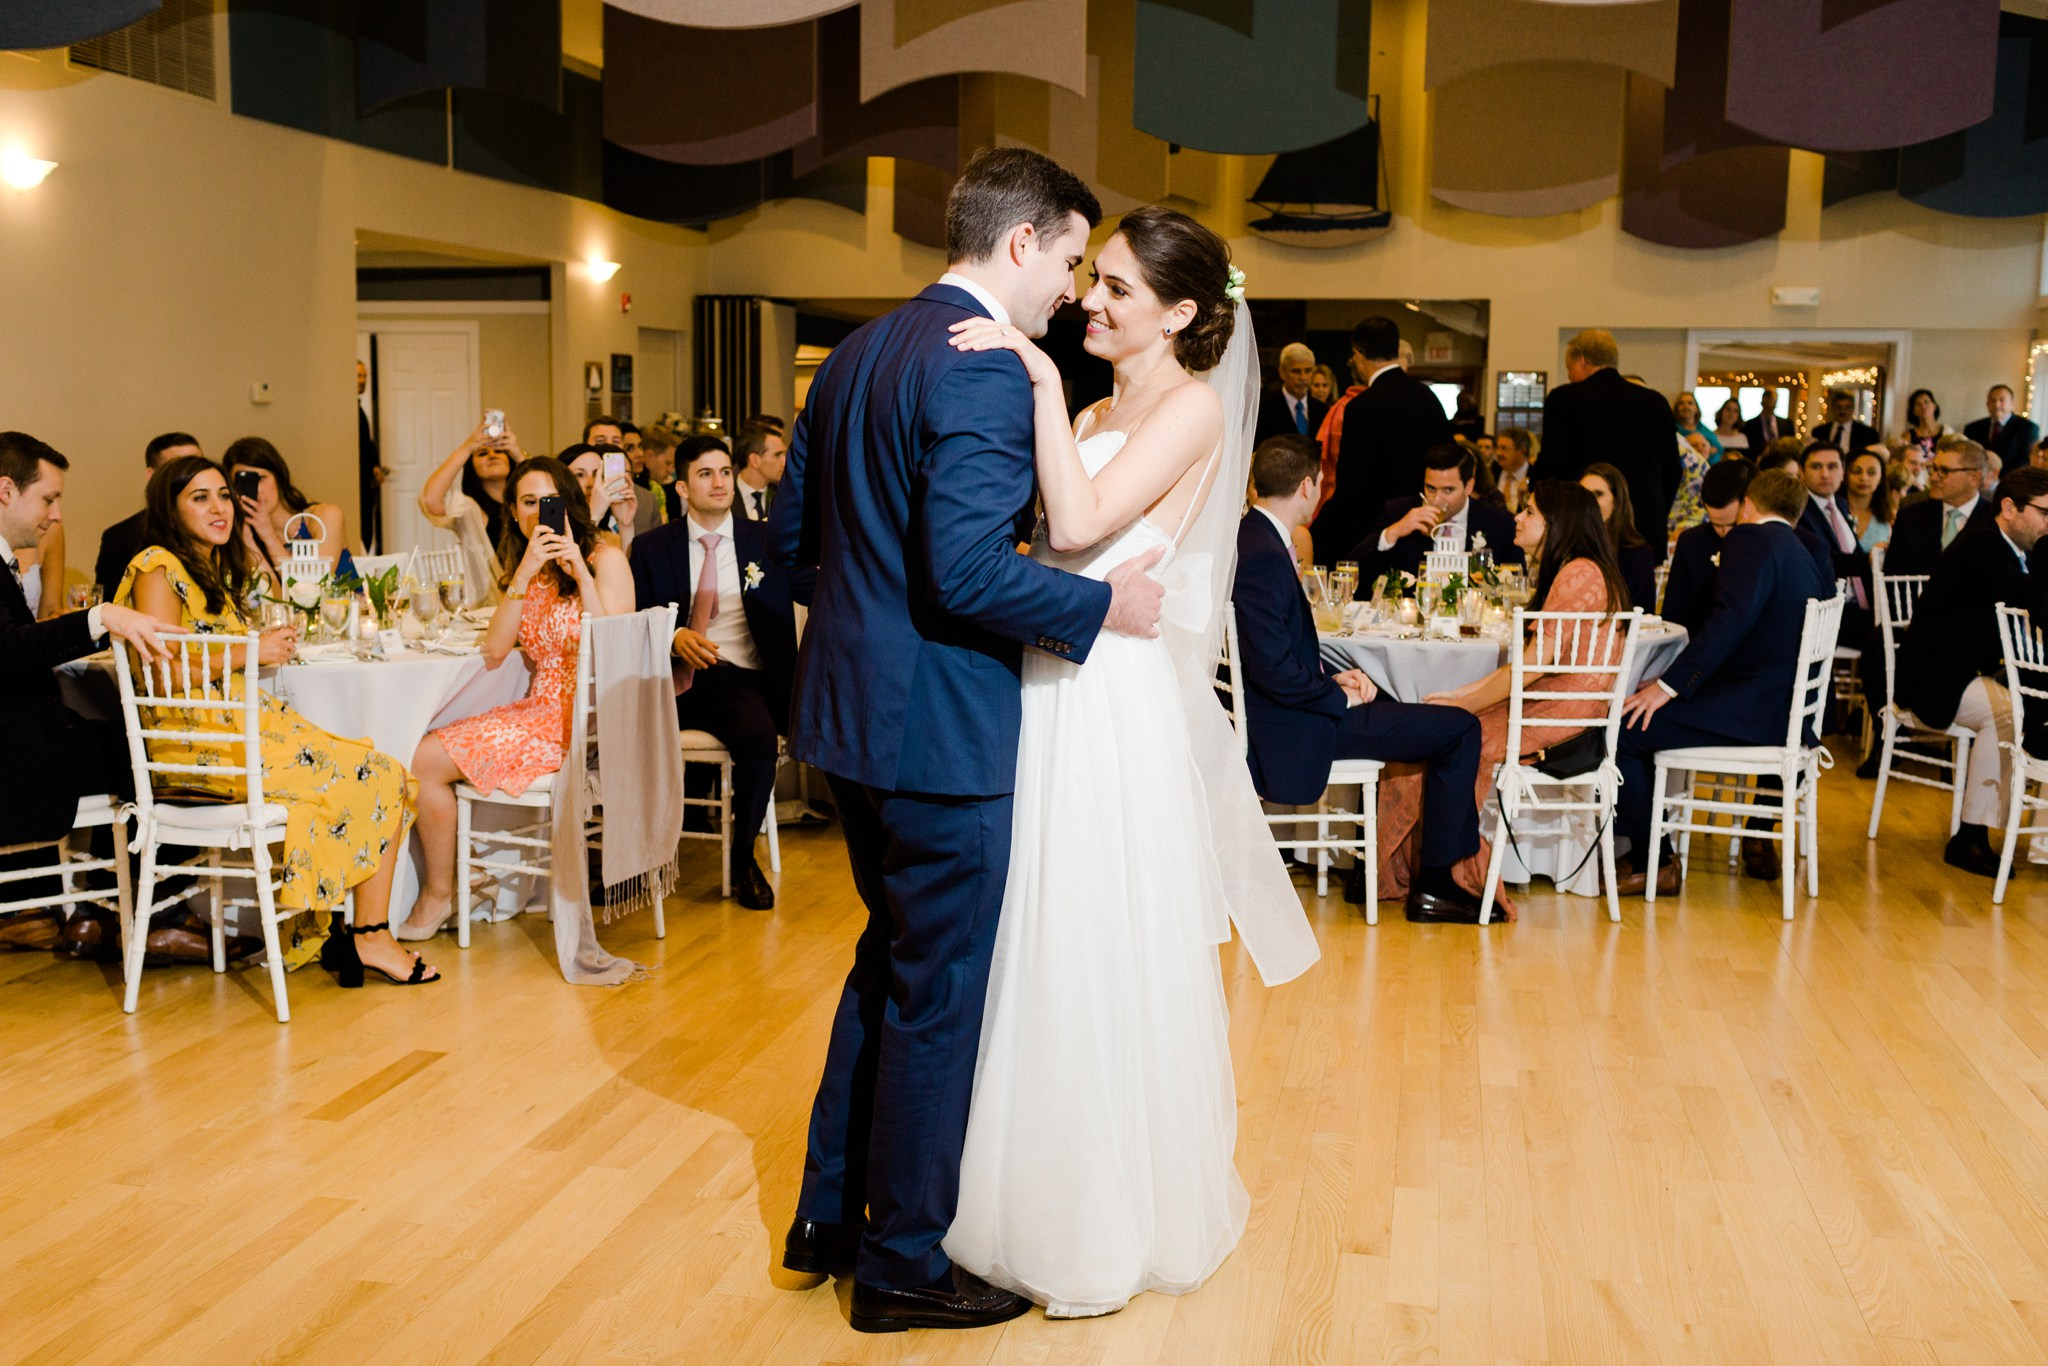 cape_cod_wedding_deborah_zoe_Photography_00068.JPG